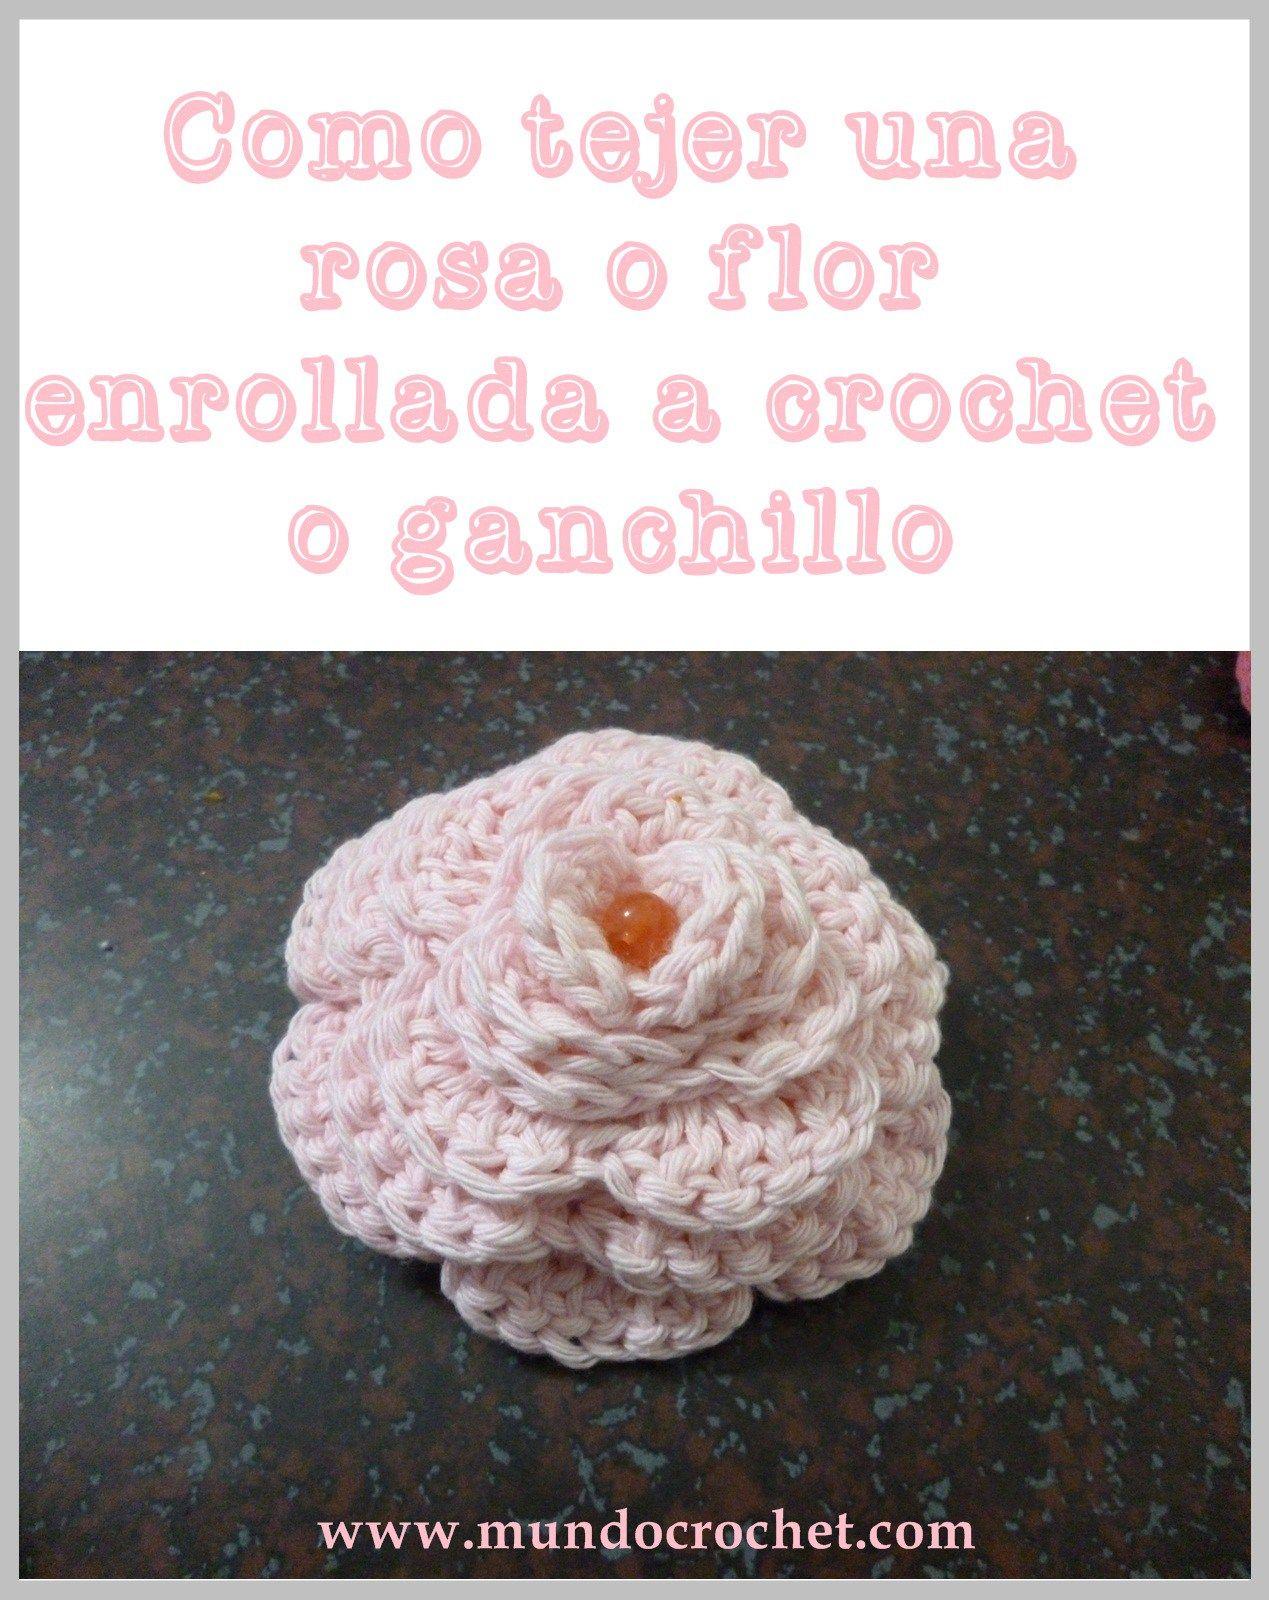 Como tejer una rosa o flor enrollada a crochet o ganchillo00